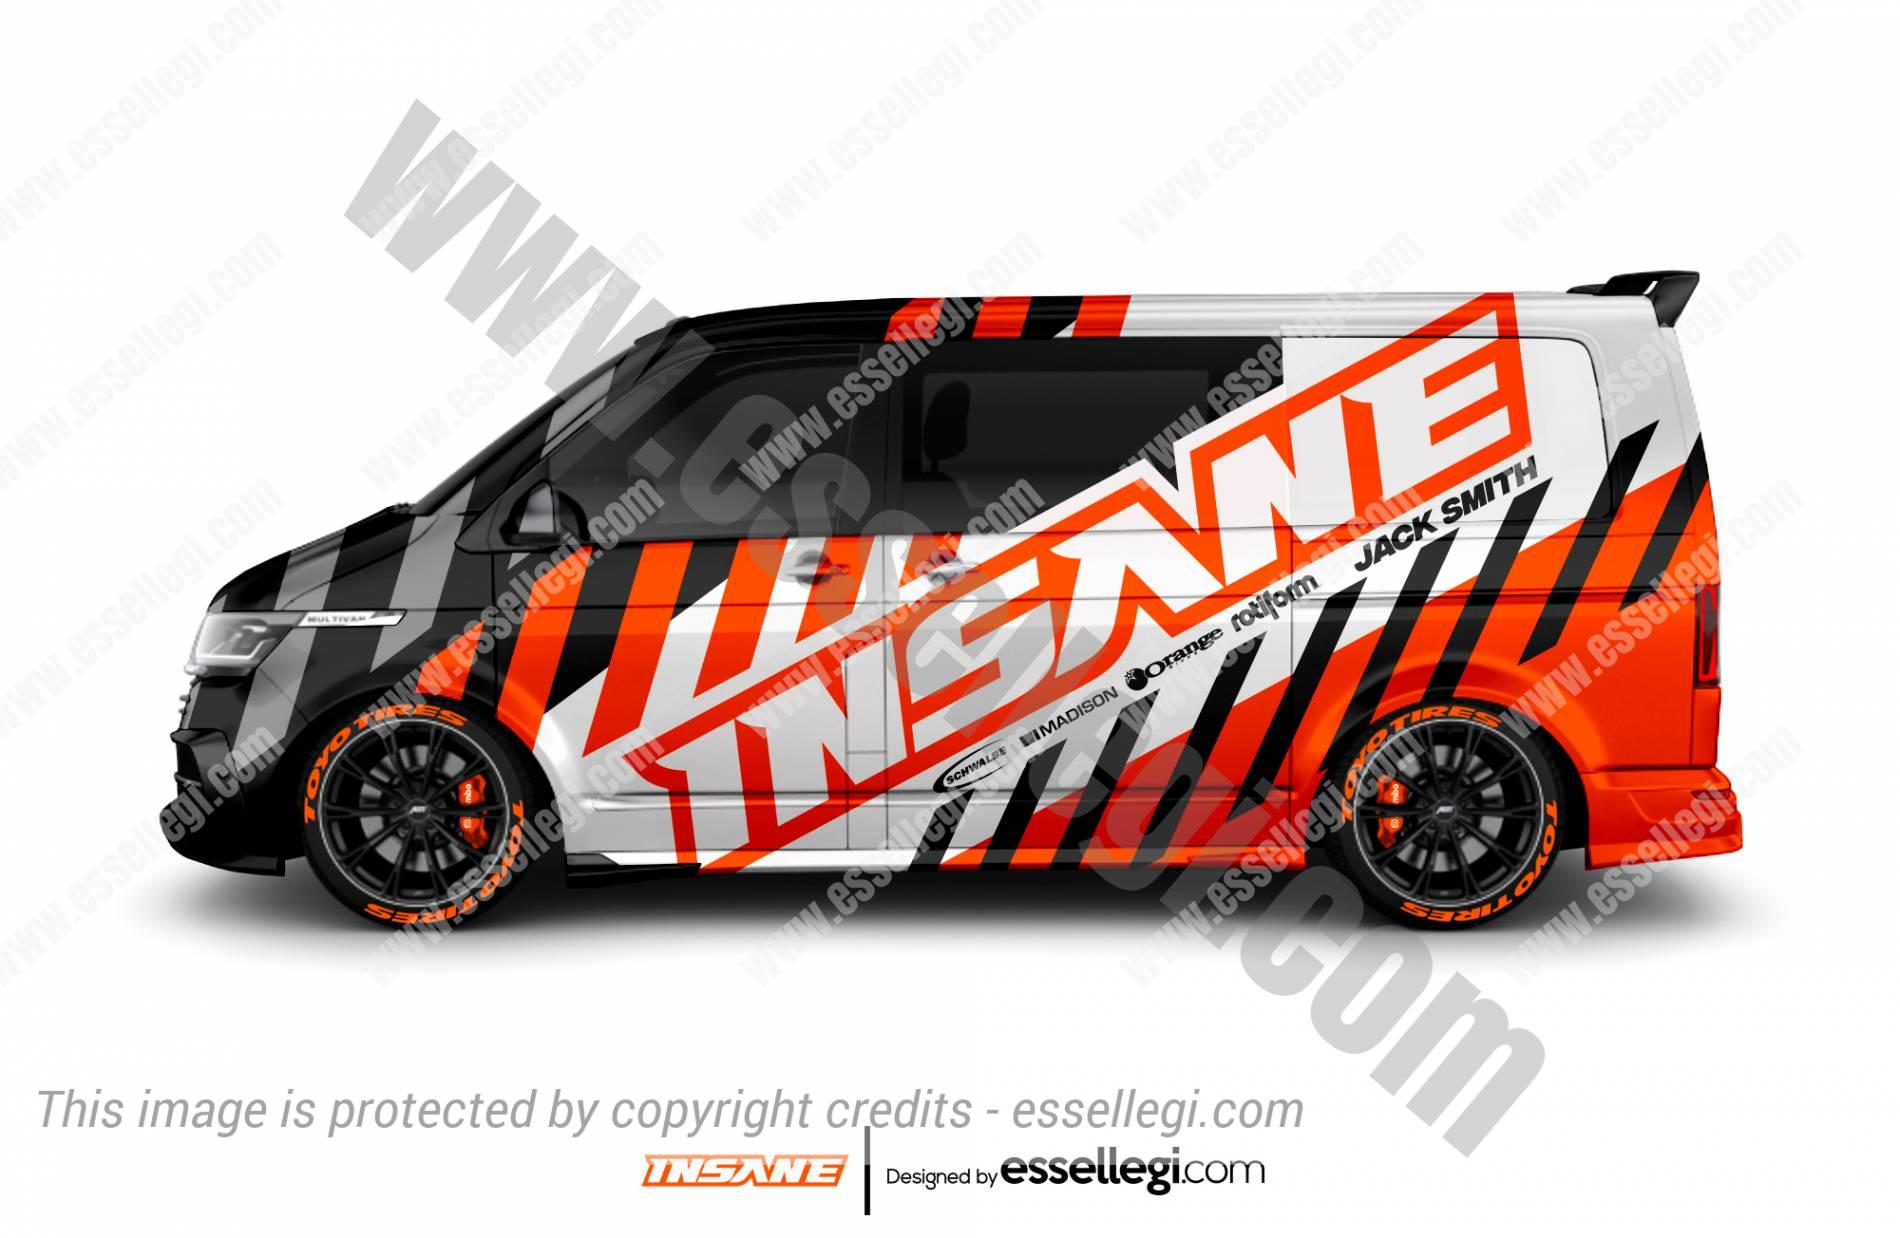 VW Transporter Wrap Design. VW Transporter Wrap | Van Wrap Design by Essellegi. Van Signs, Van Signage, Van Wrapping, Van Signwriting, Van Wrap Designer, Signs for Van, Van Logo, Van Graphic by Essellegi.